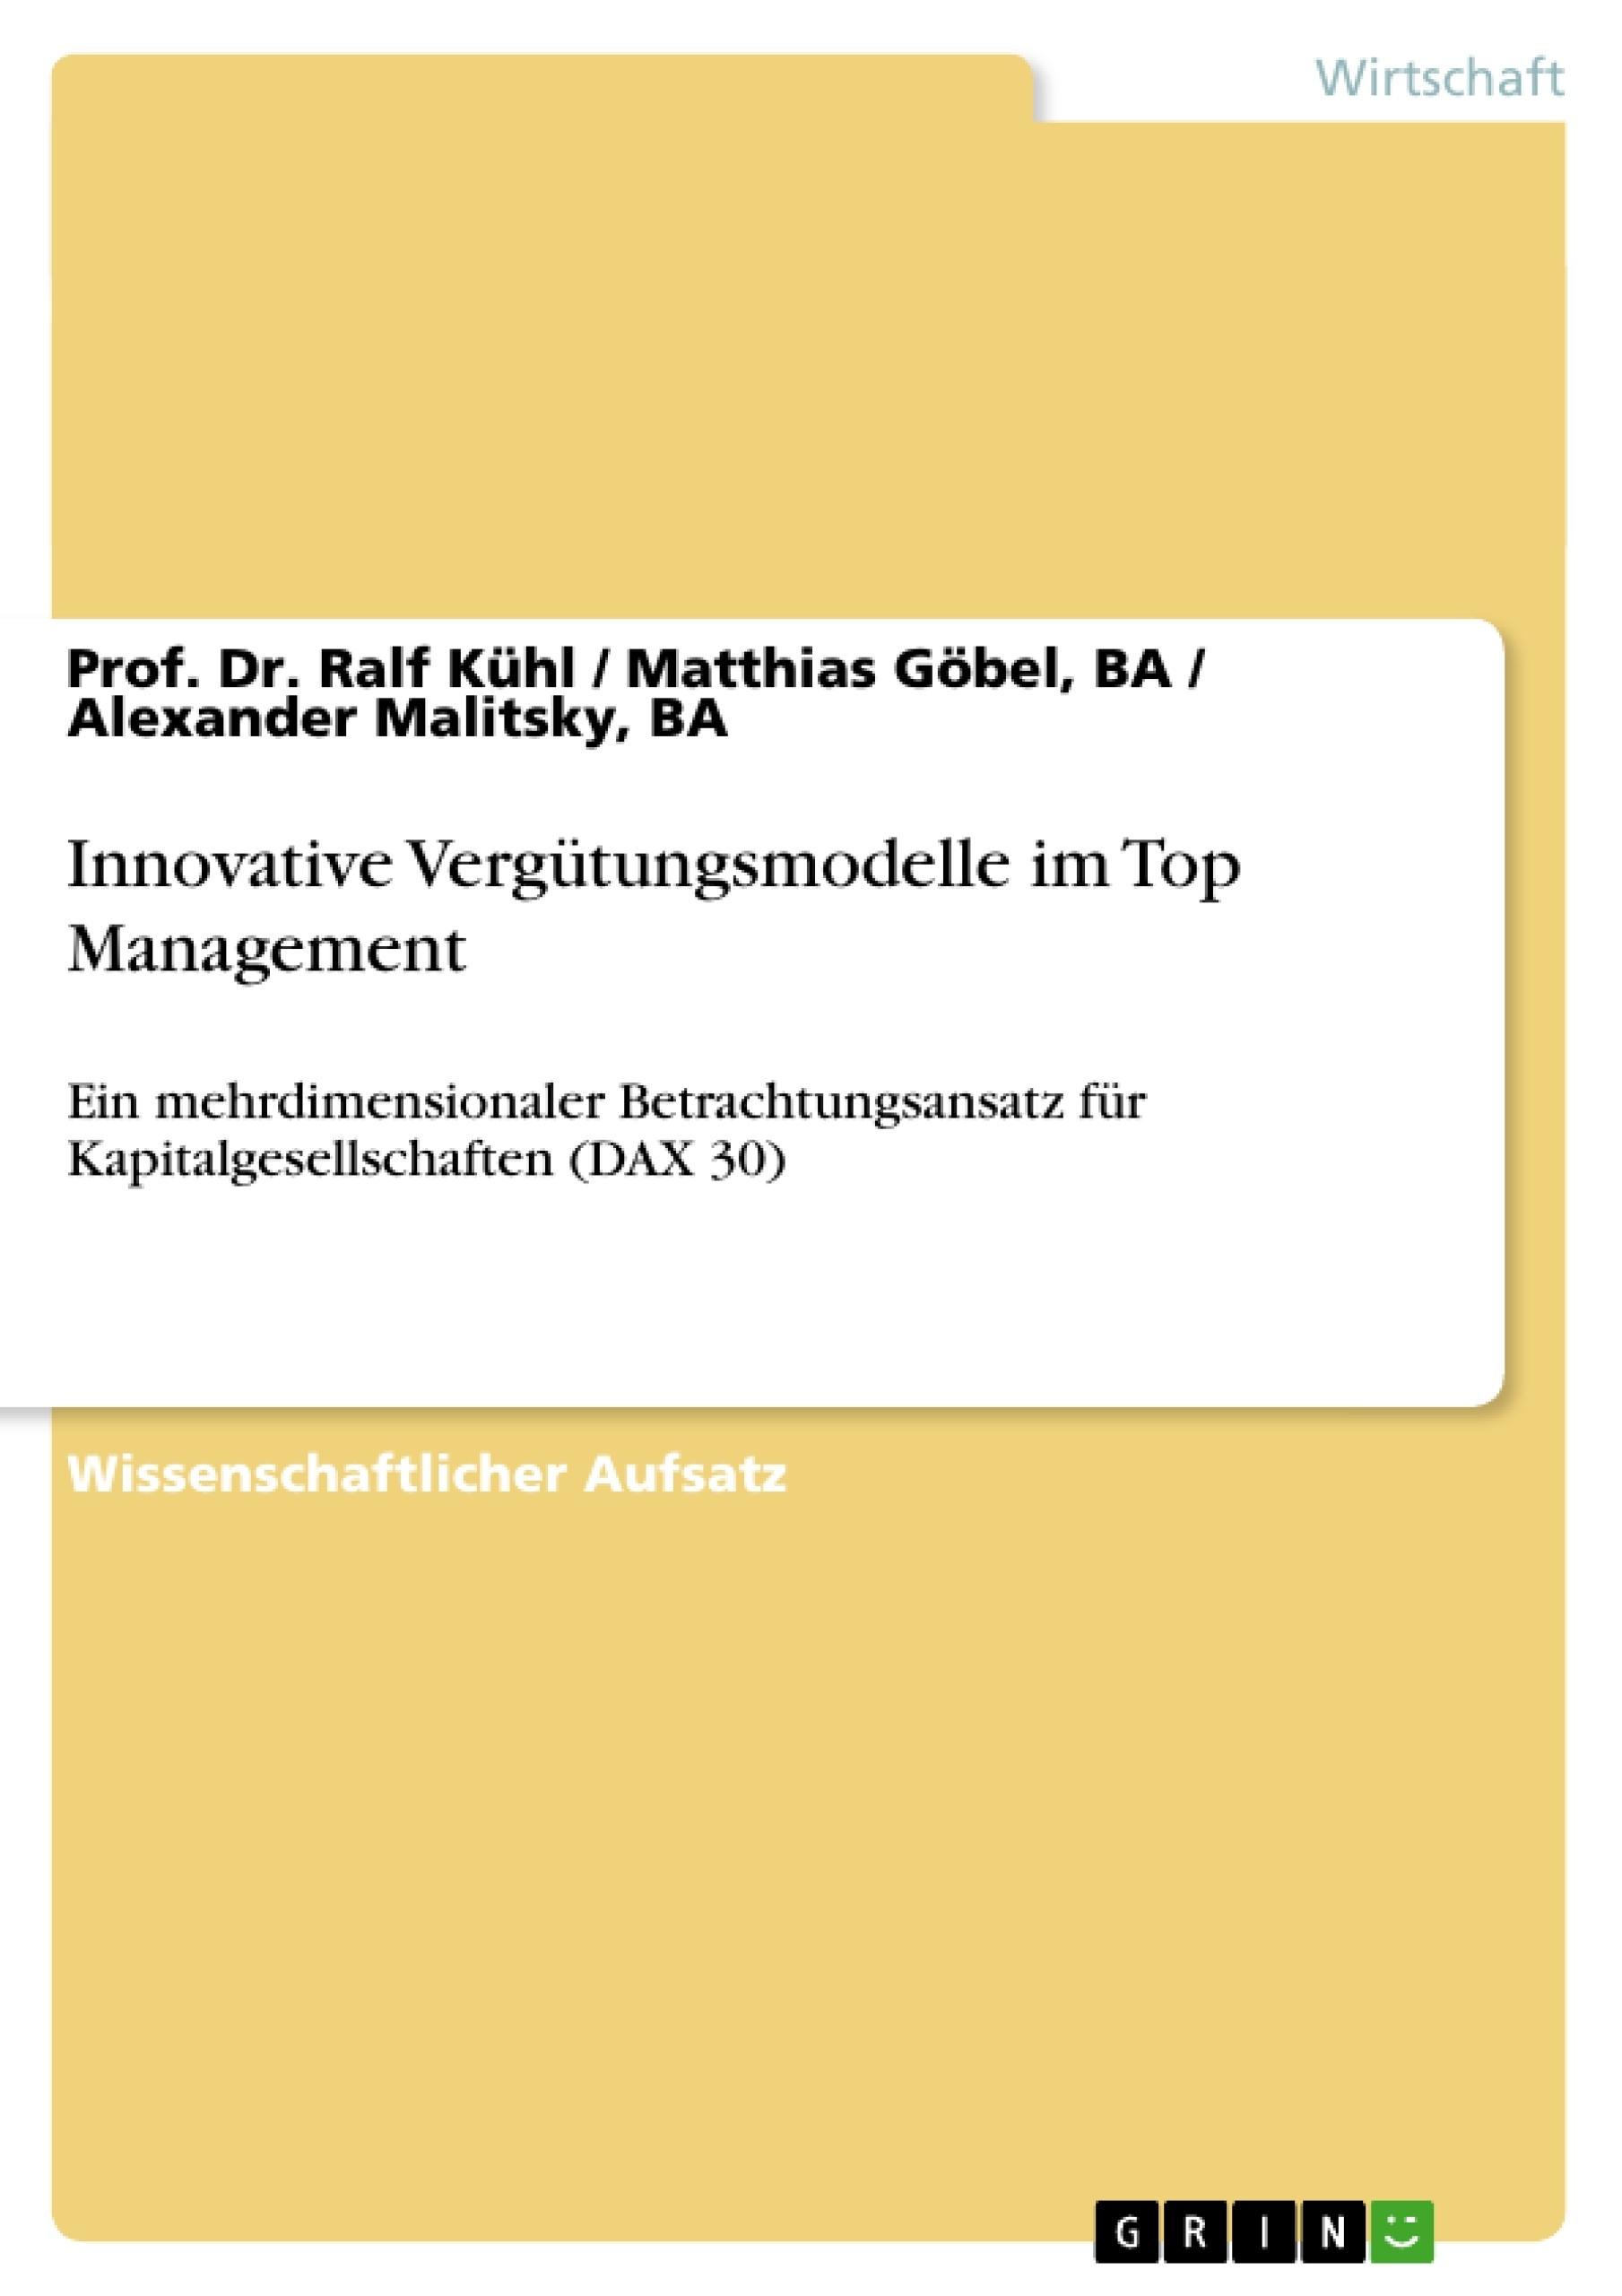 Titel: Innovative Vergütungsmodelle im Top Management